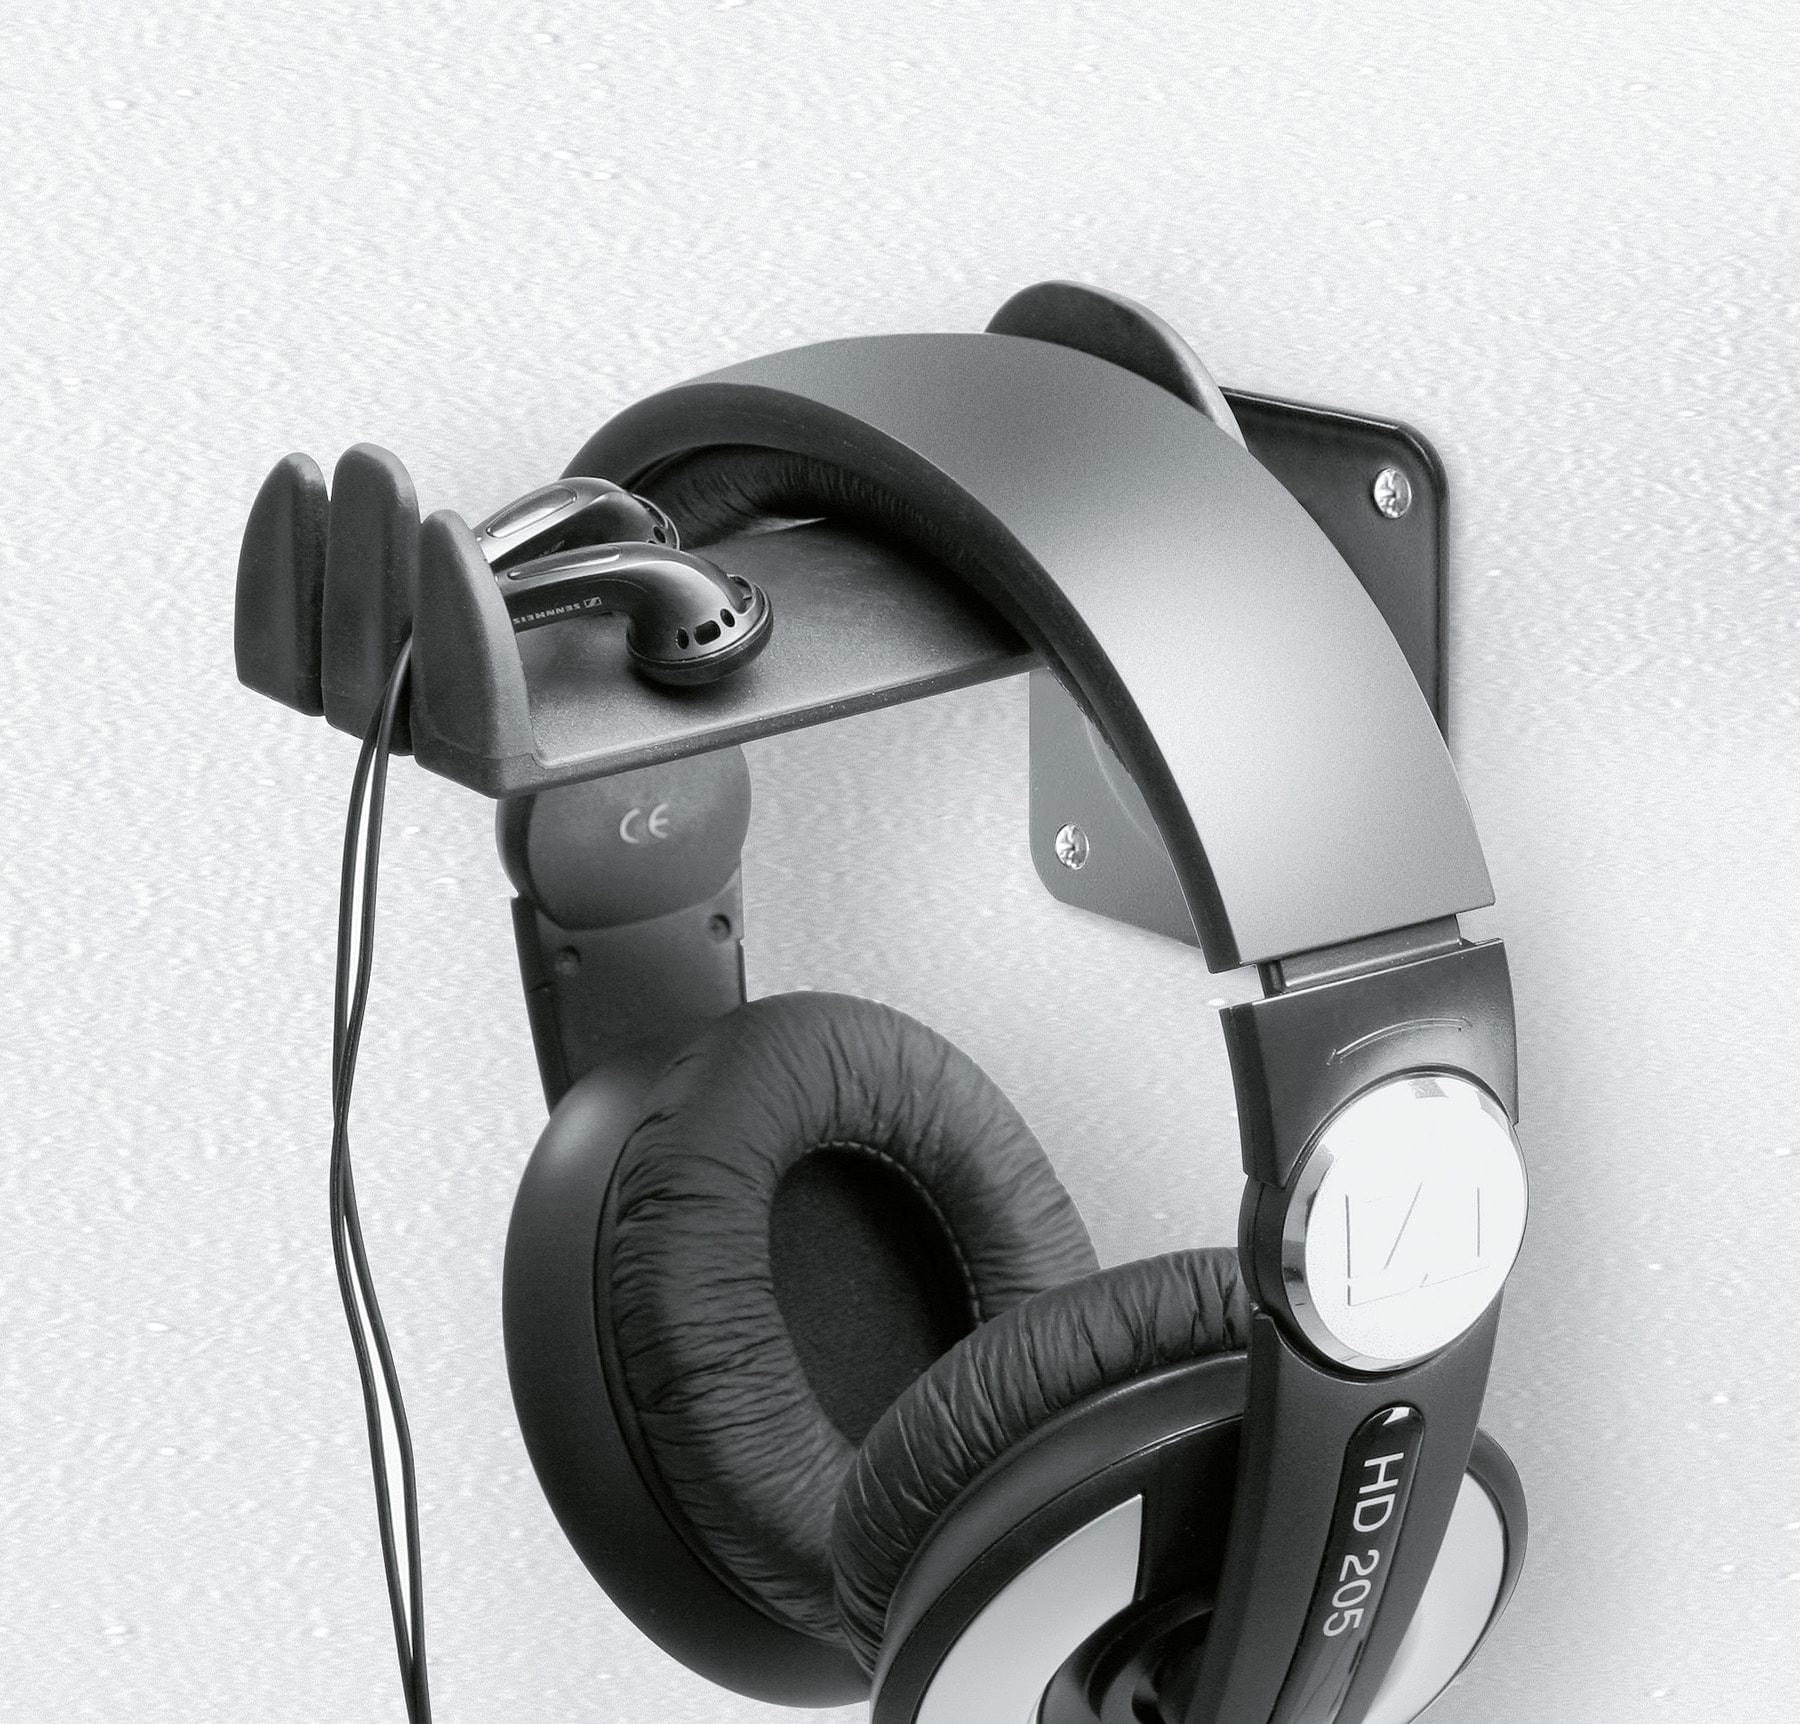 KM16310 - Headphone wall holder